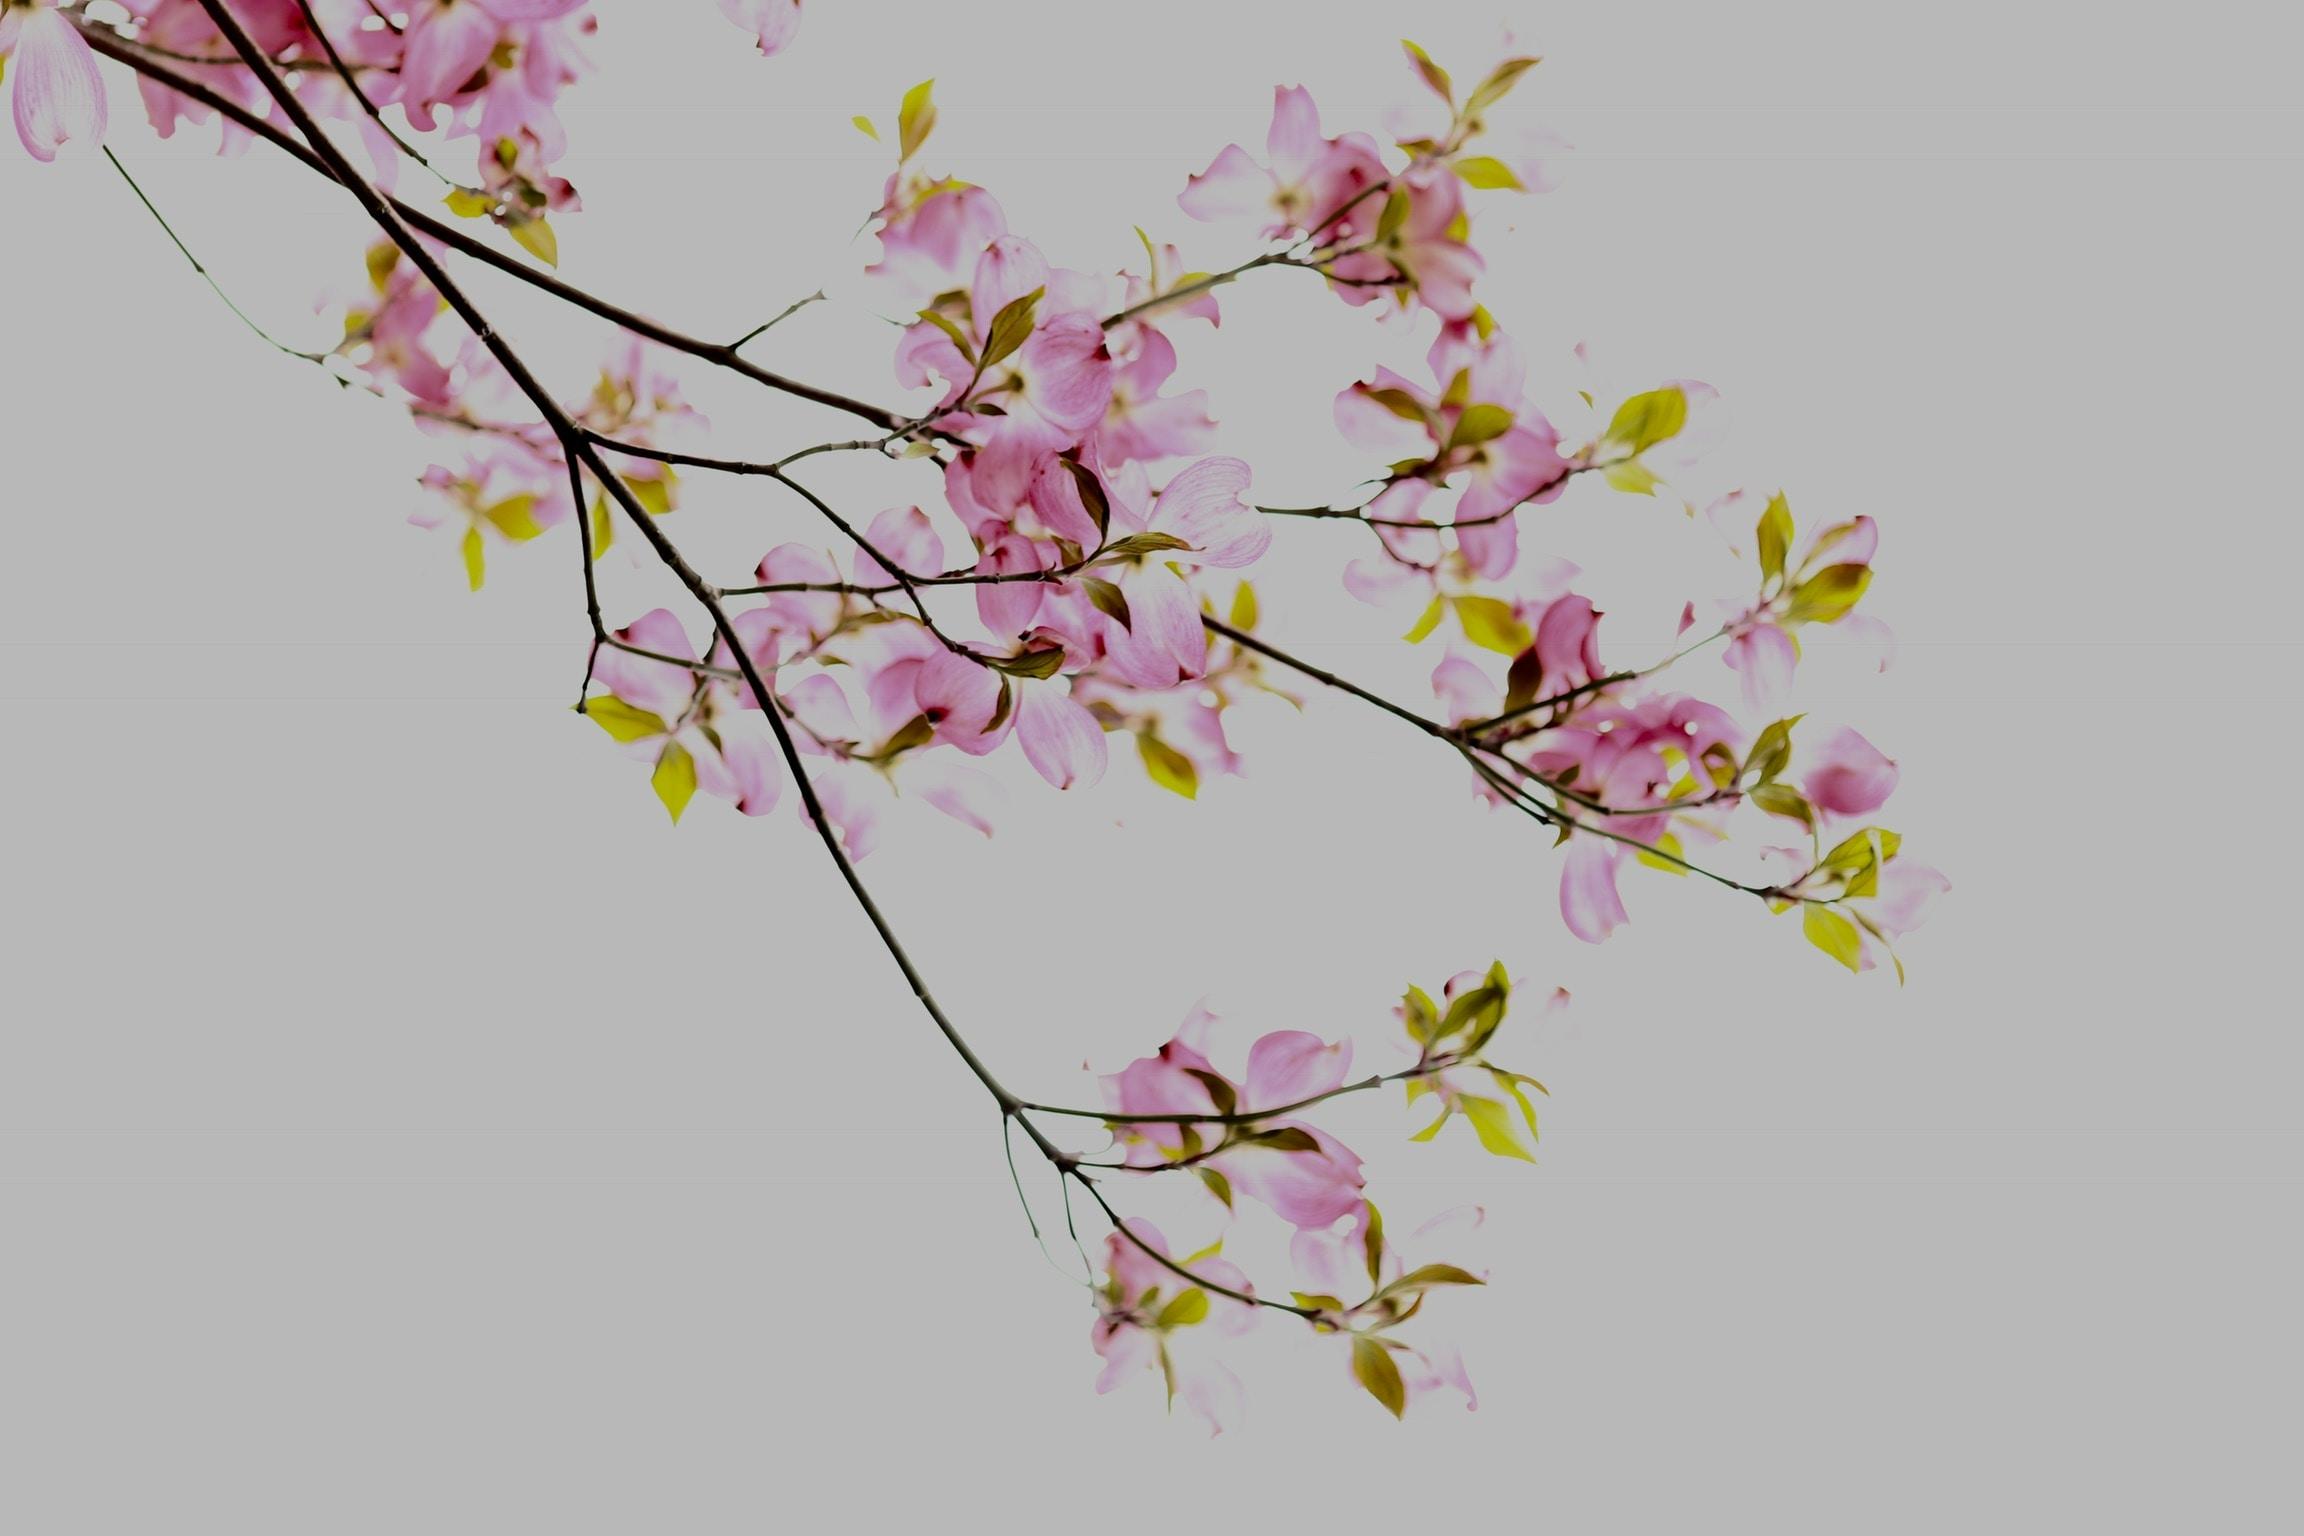 photo of pink petaled tree